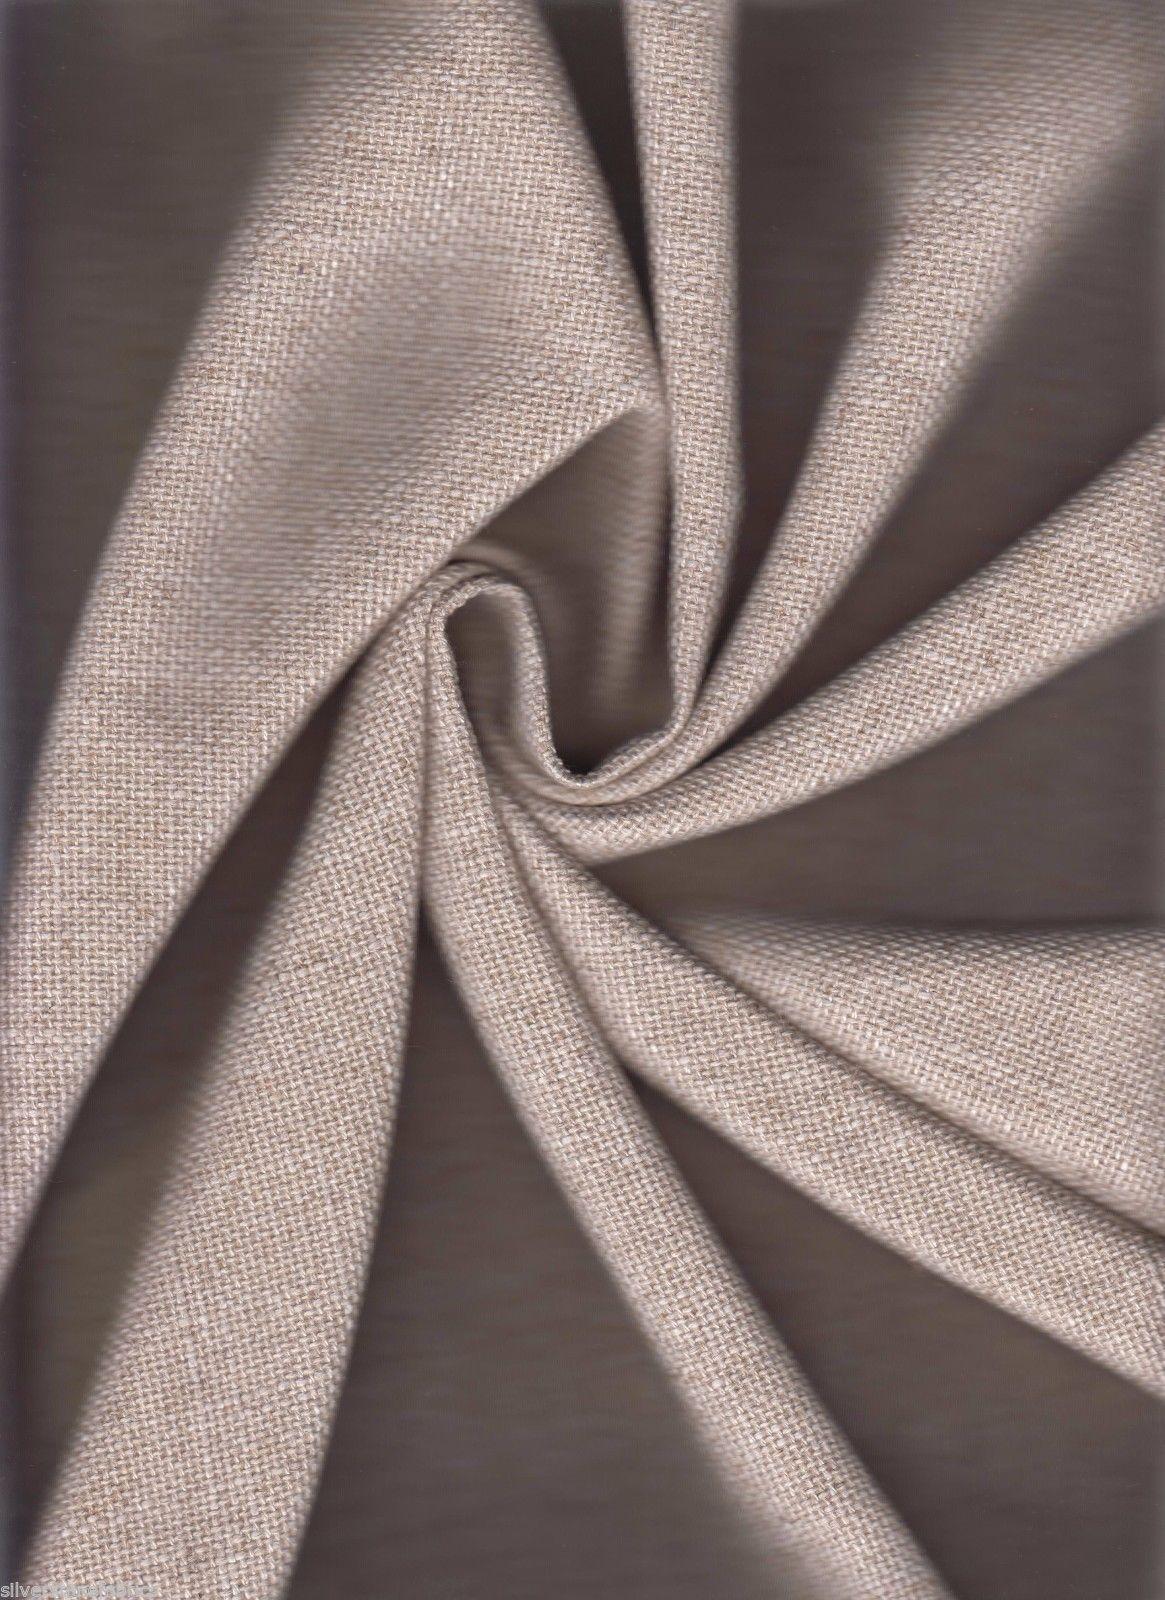 Coraggio Tela para Tapizar Rústico Weave Lino Blanco Crudo 3.4m GV4